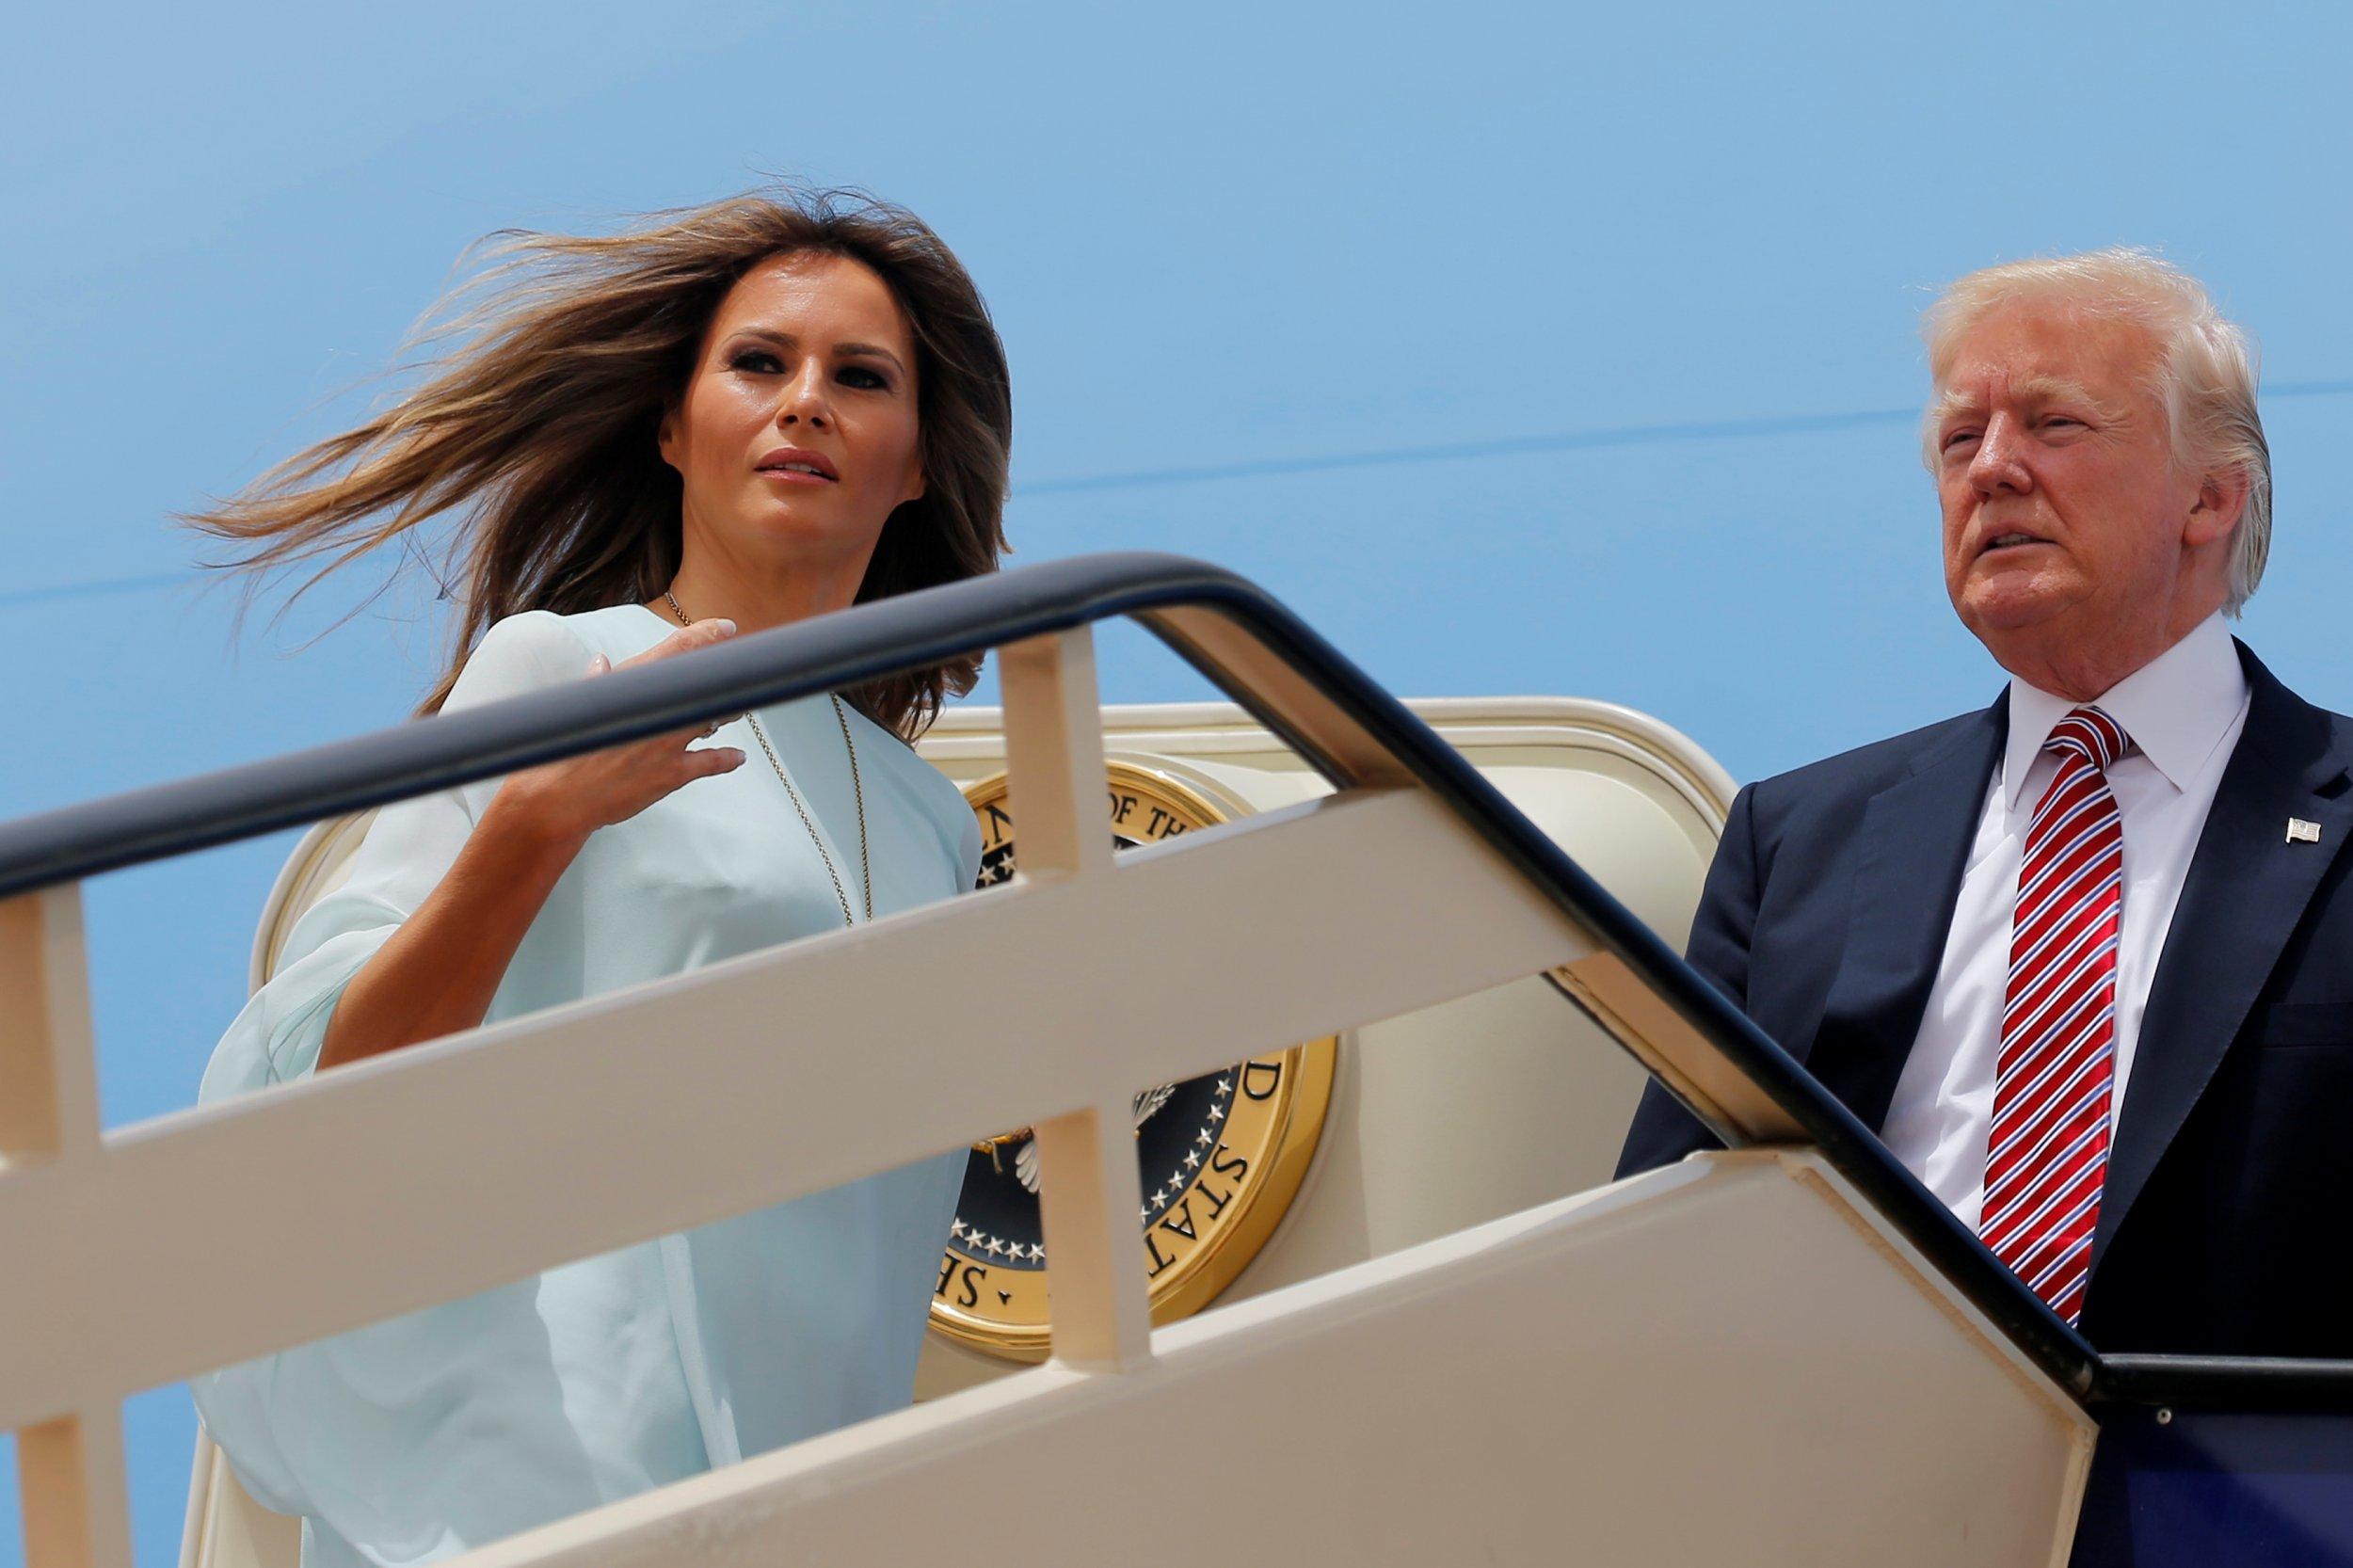 Melania and Donald Trump